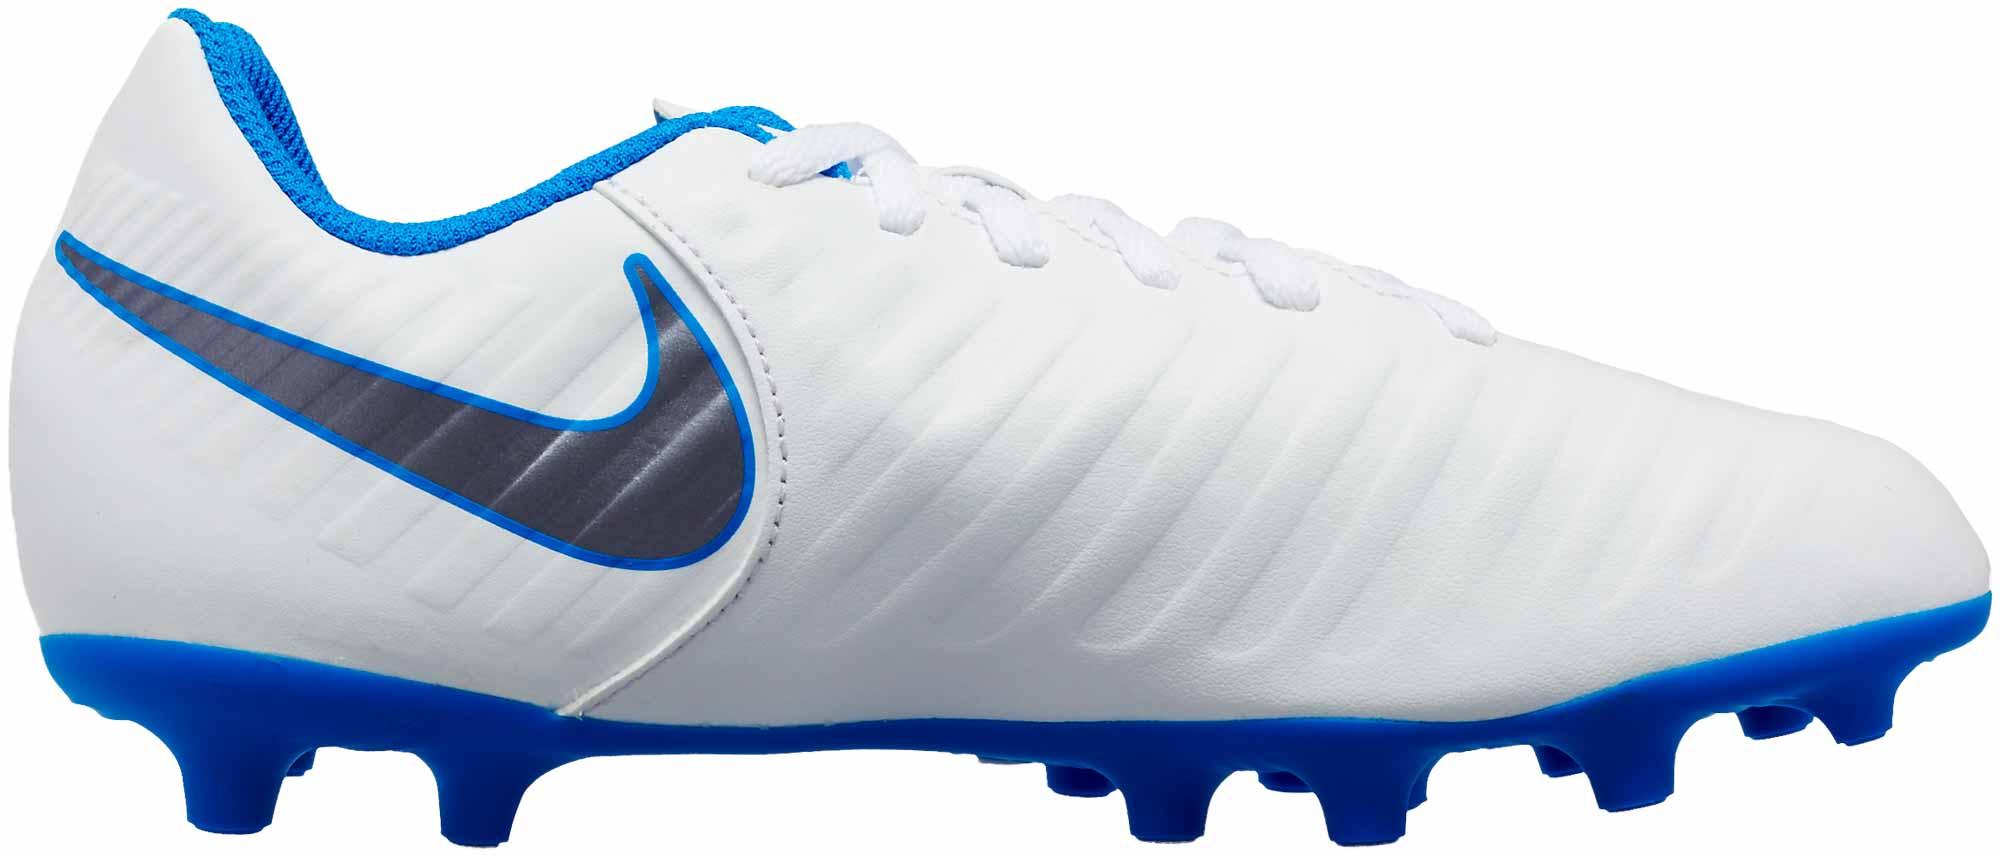 d83813f0c Nike Tiempo Legend 7 Club FG - Youth - White/Metallic Cool Grey/Blue ...